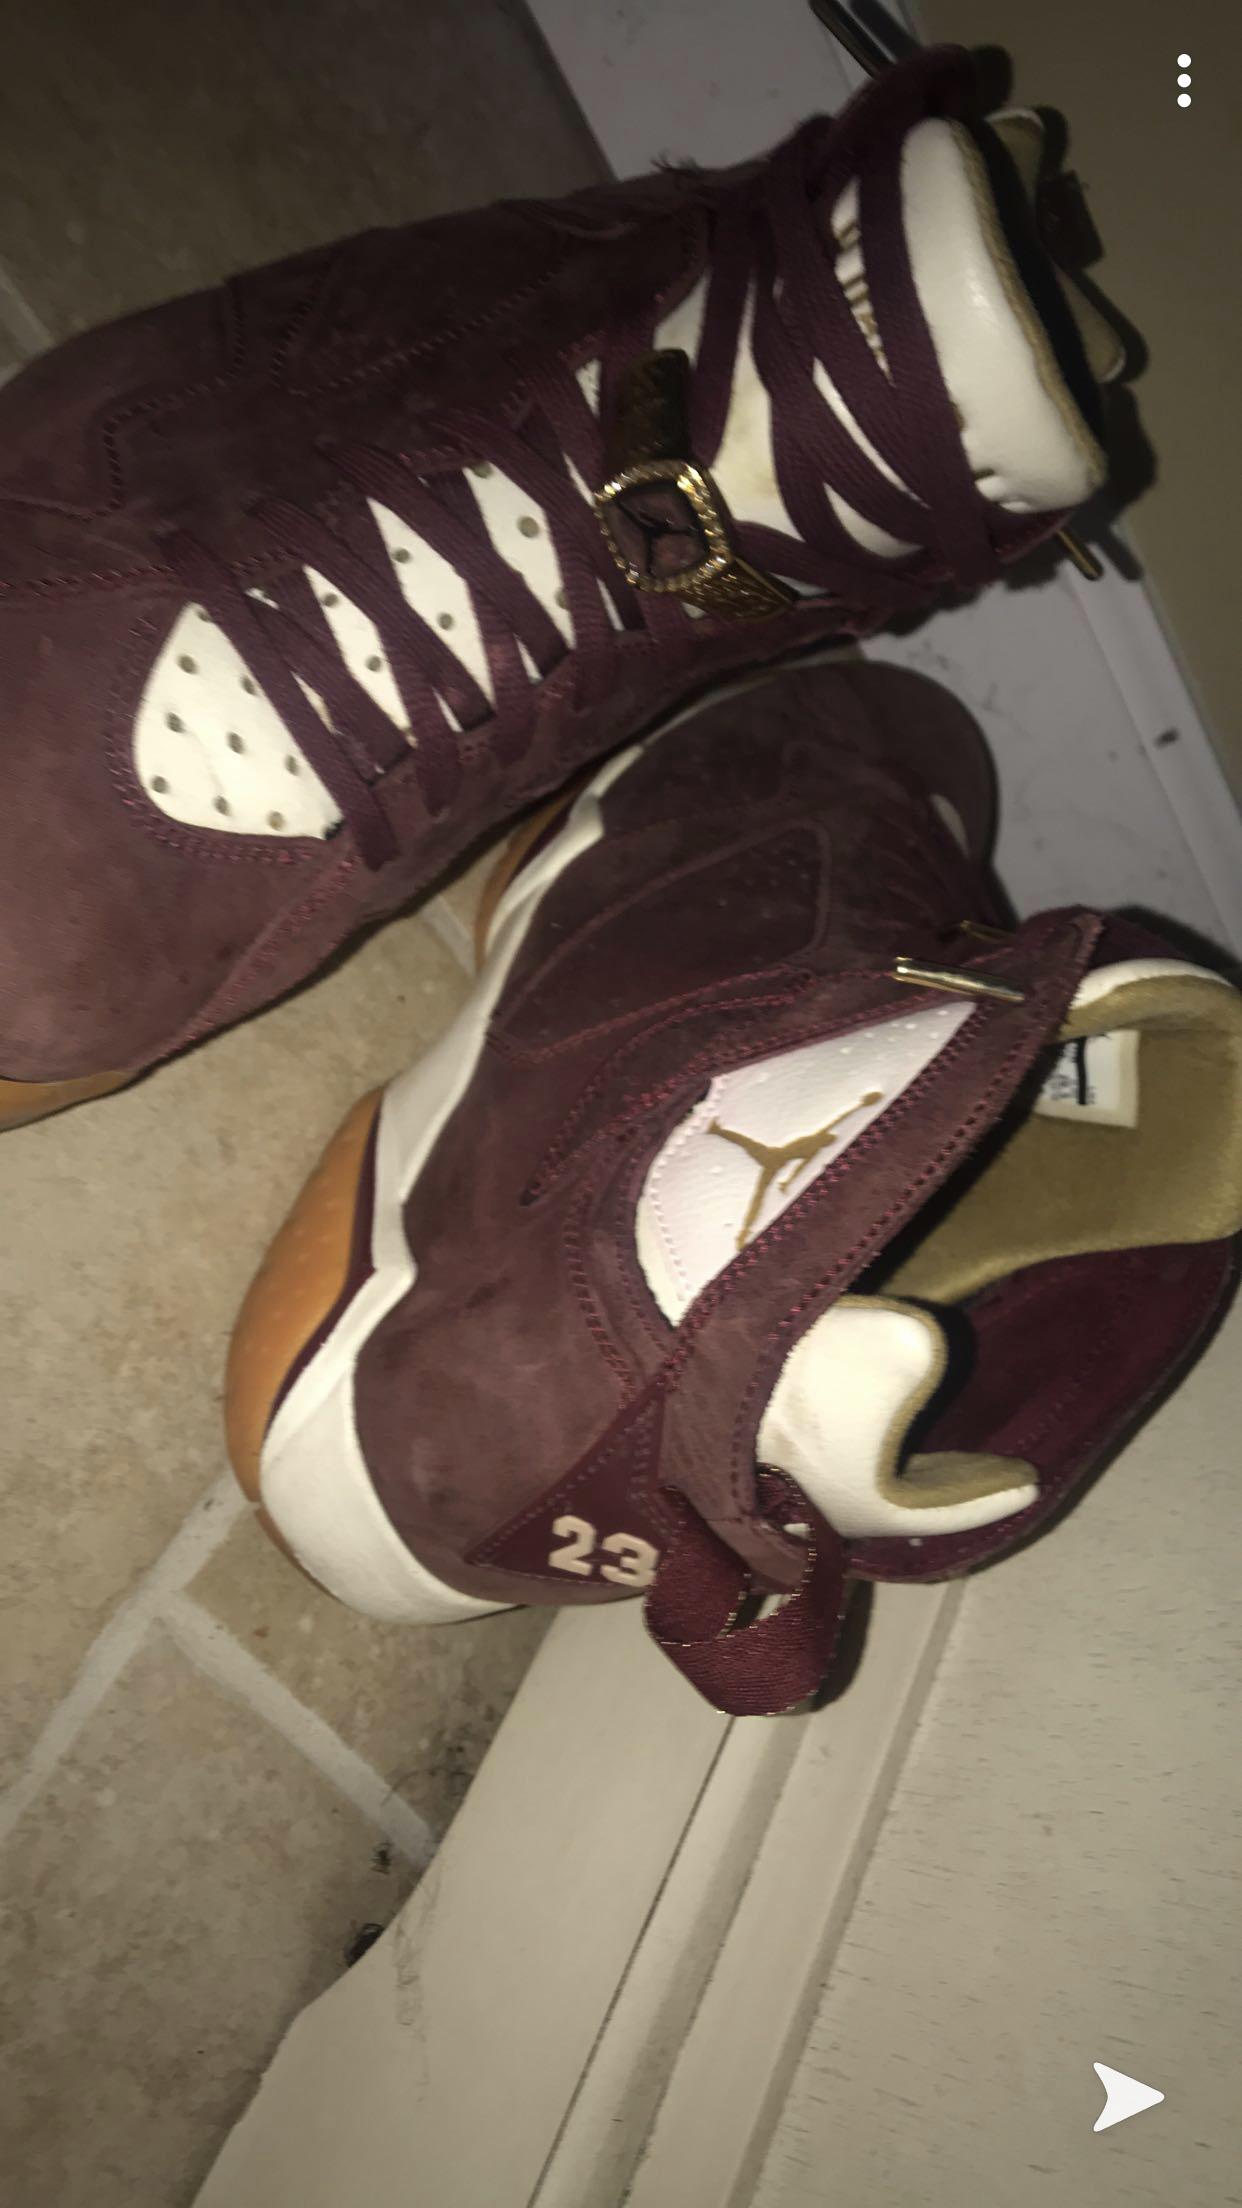 Air Jordan - $180 - Size 8.5